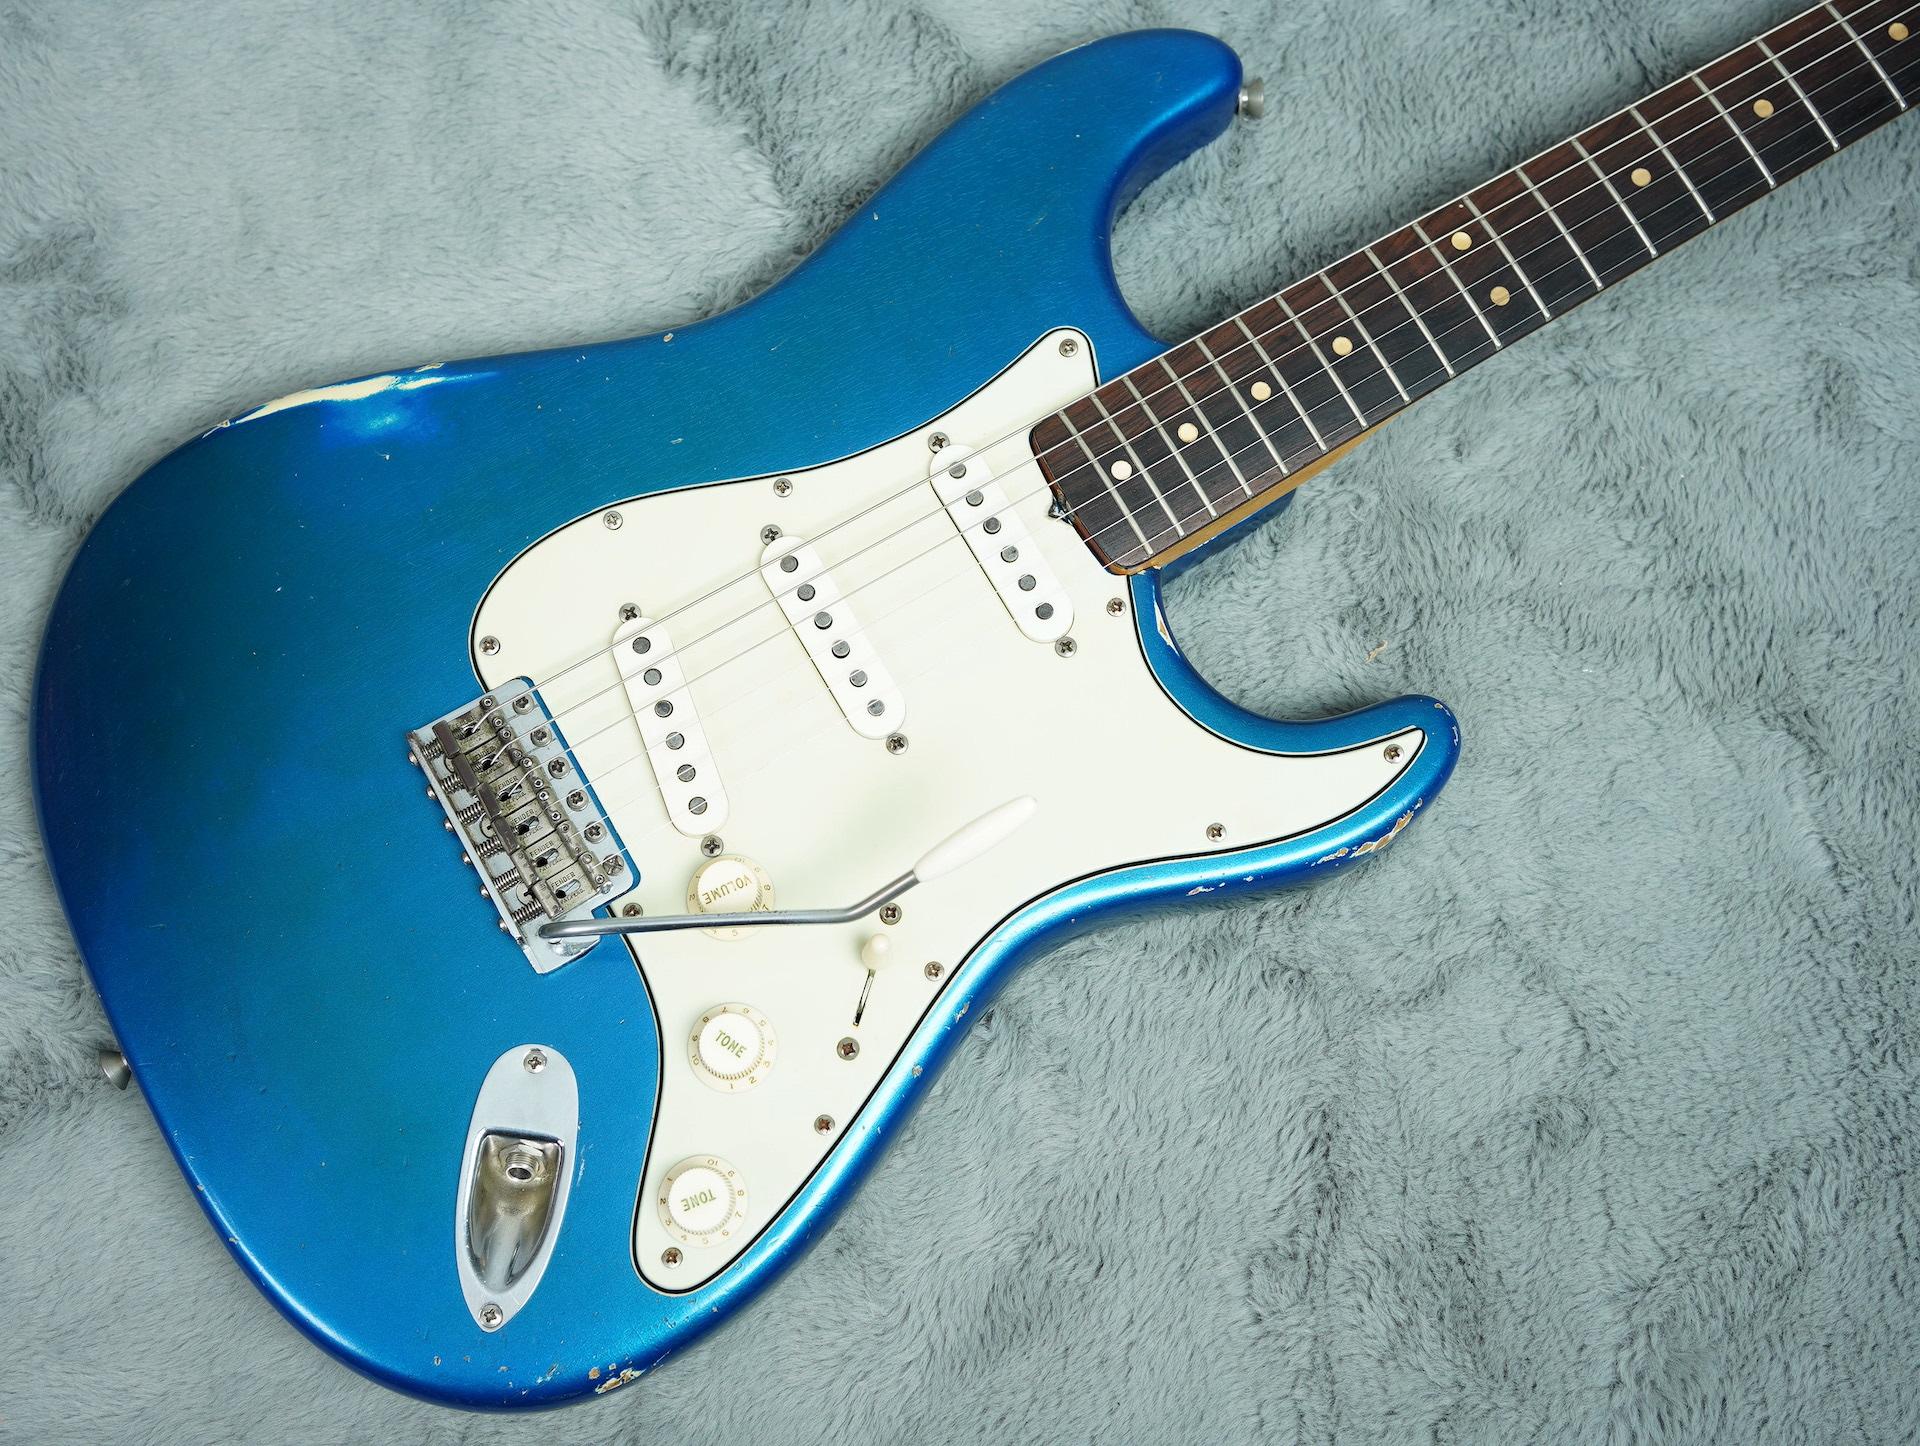 1964 Fender Stratocaster Lake Placid Blue body only refin + HSC